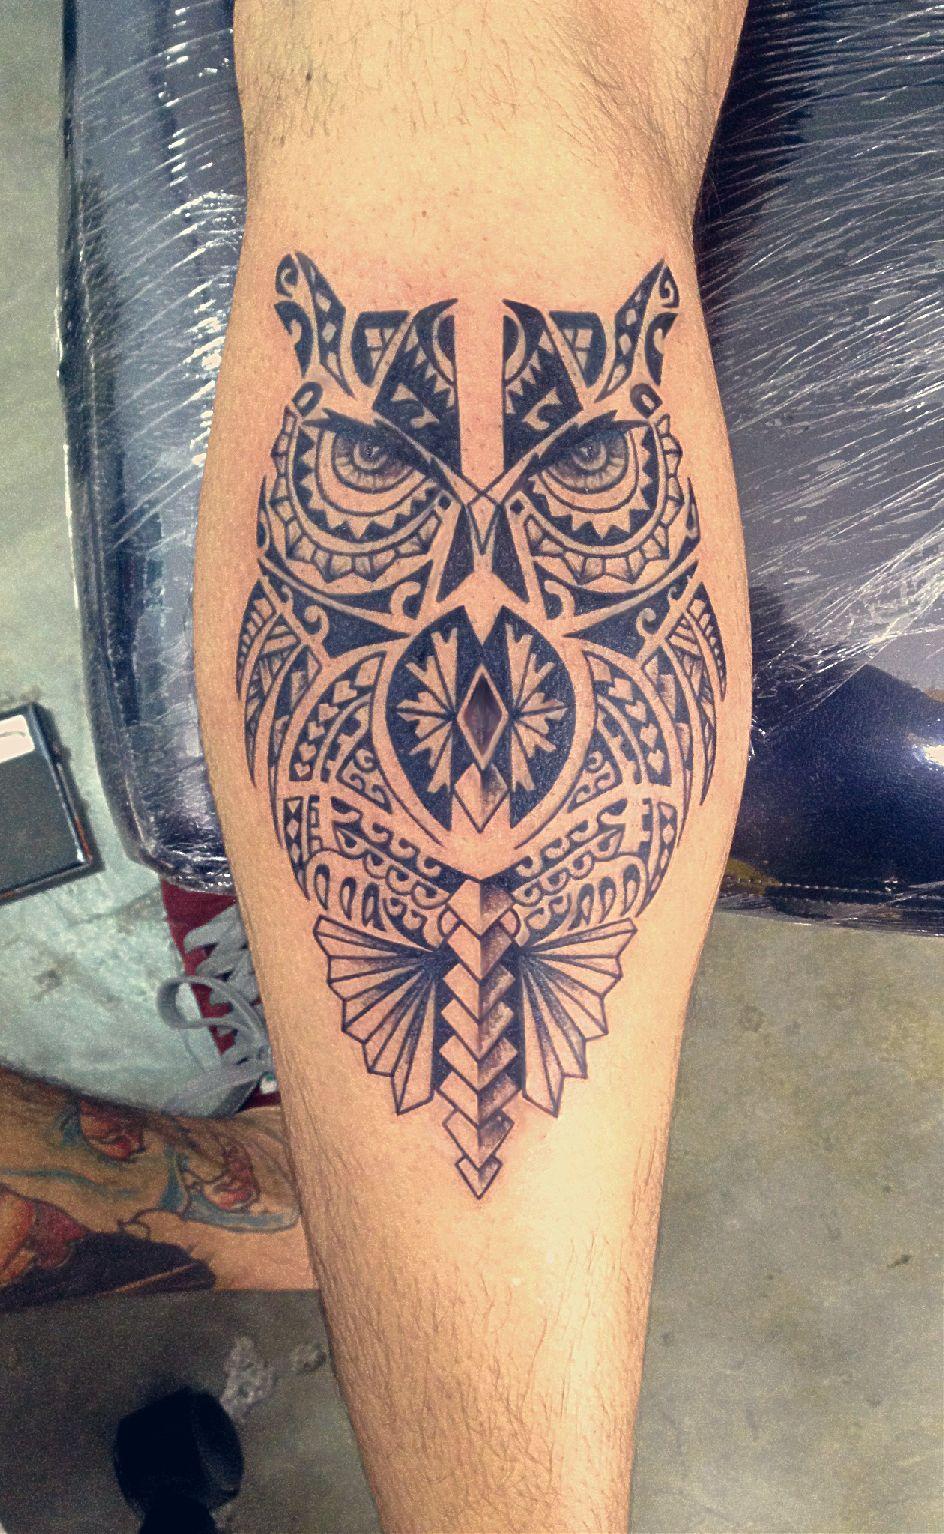 Tatuagem / Maori / Tribal / Polinésia / Coruja / Perna / Panturrilha / Tattoo / Polynesian / Owl / Leg / Calf #studio900 #crismaia